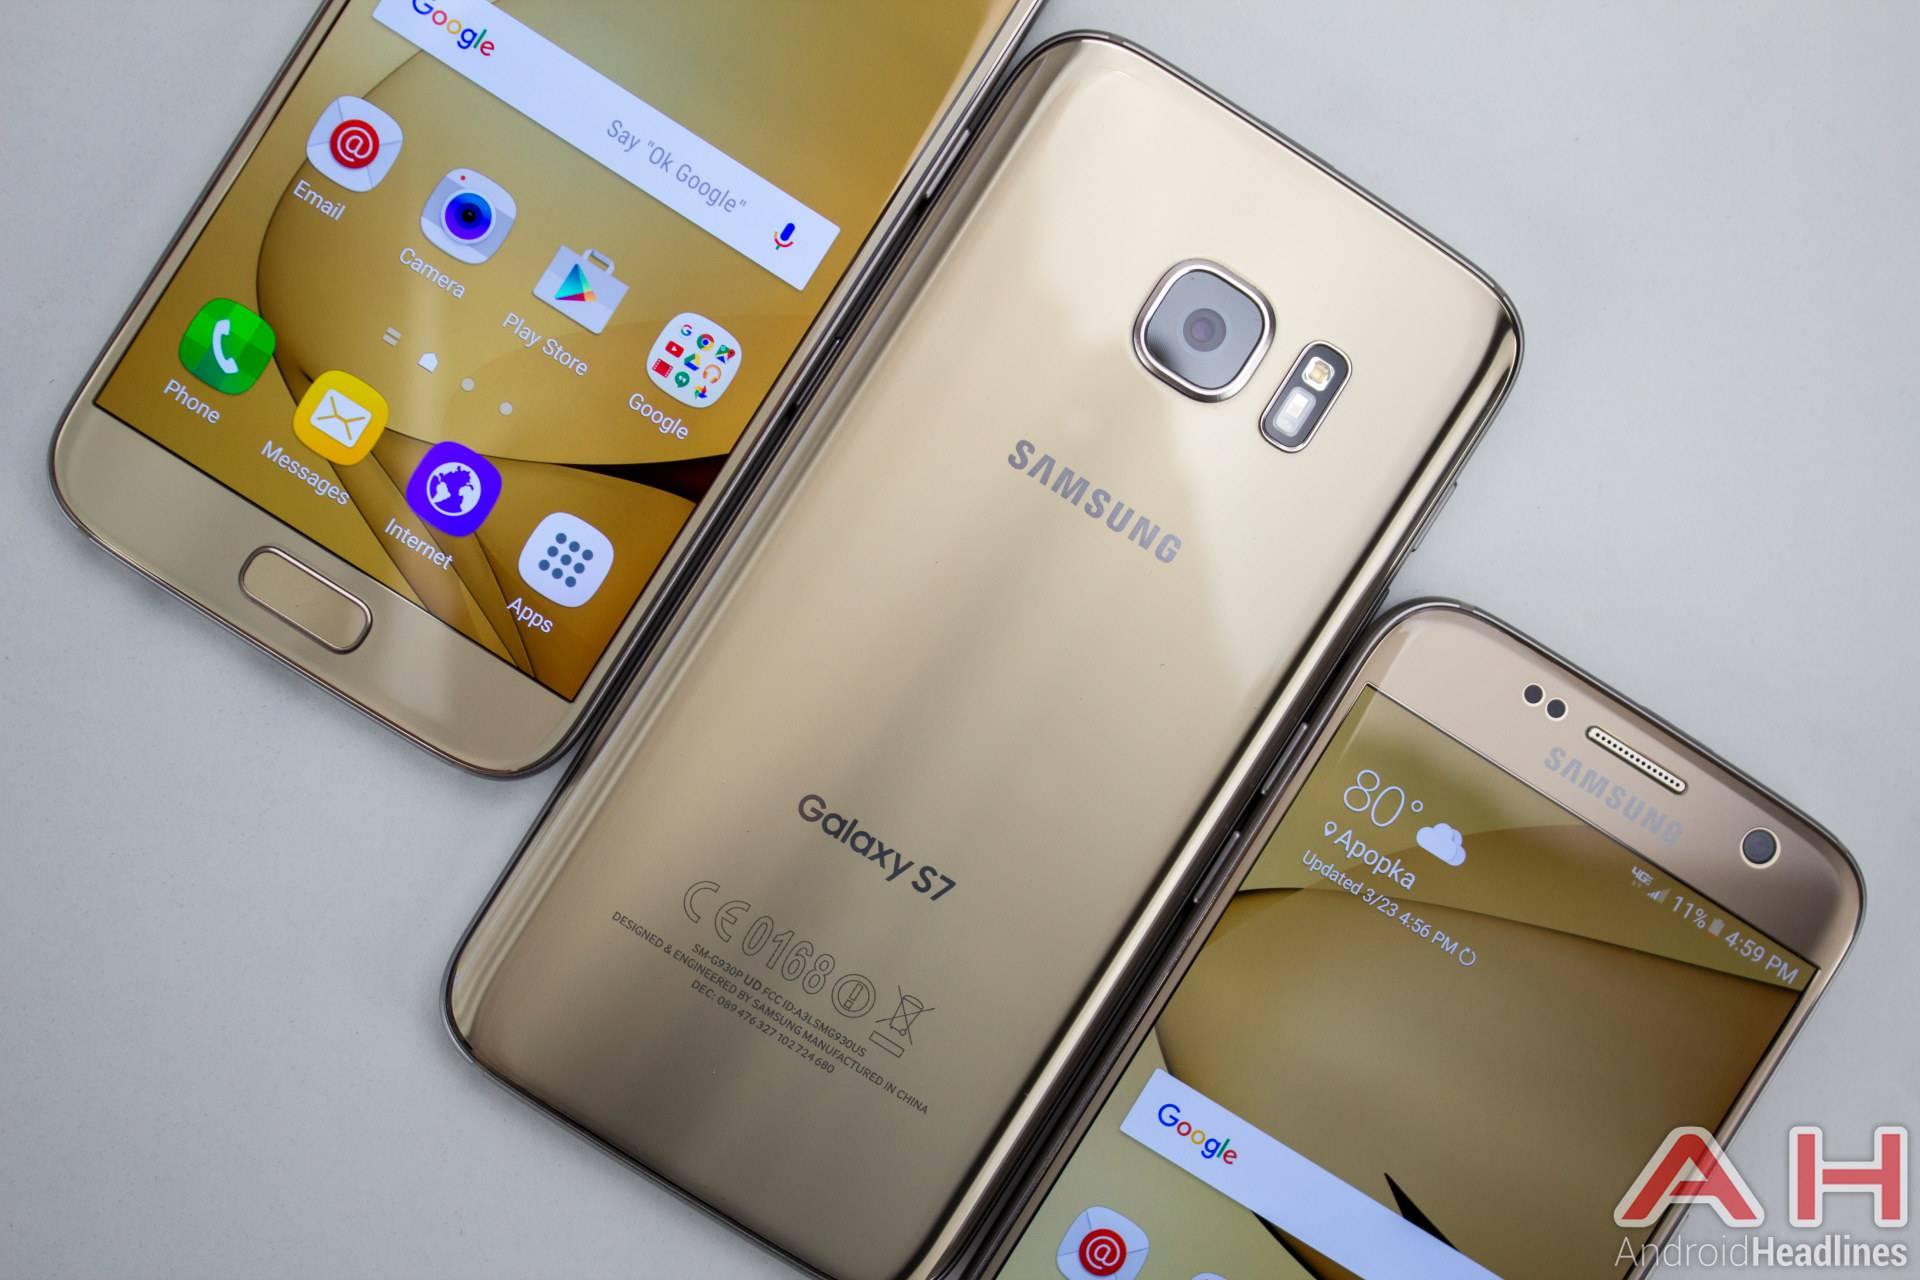 Samsung Galaxy S7 Flaw Raises Meltdown Vulnerability Concerns